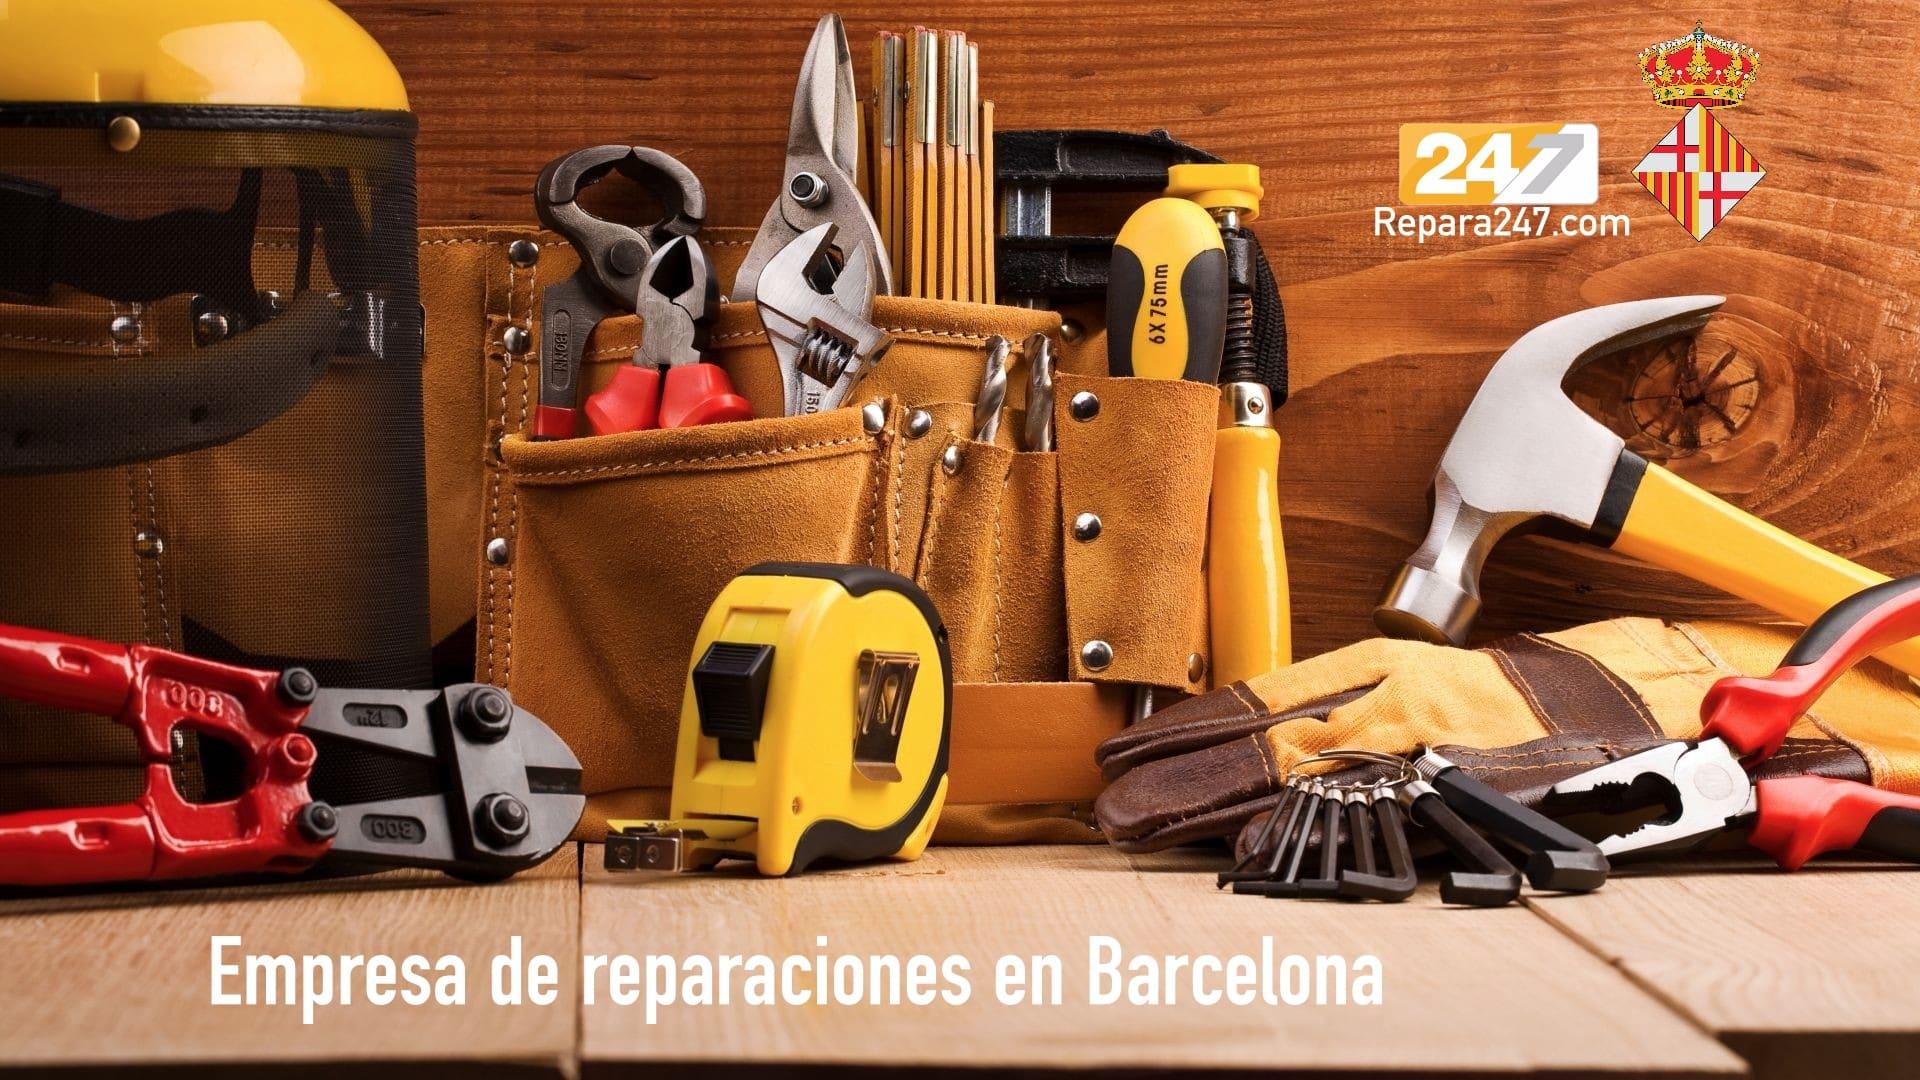 Empresa de reparaciones en Barcelona